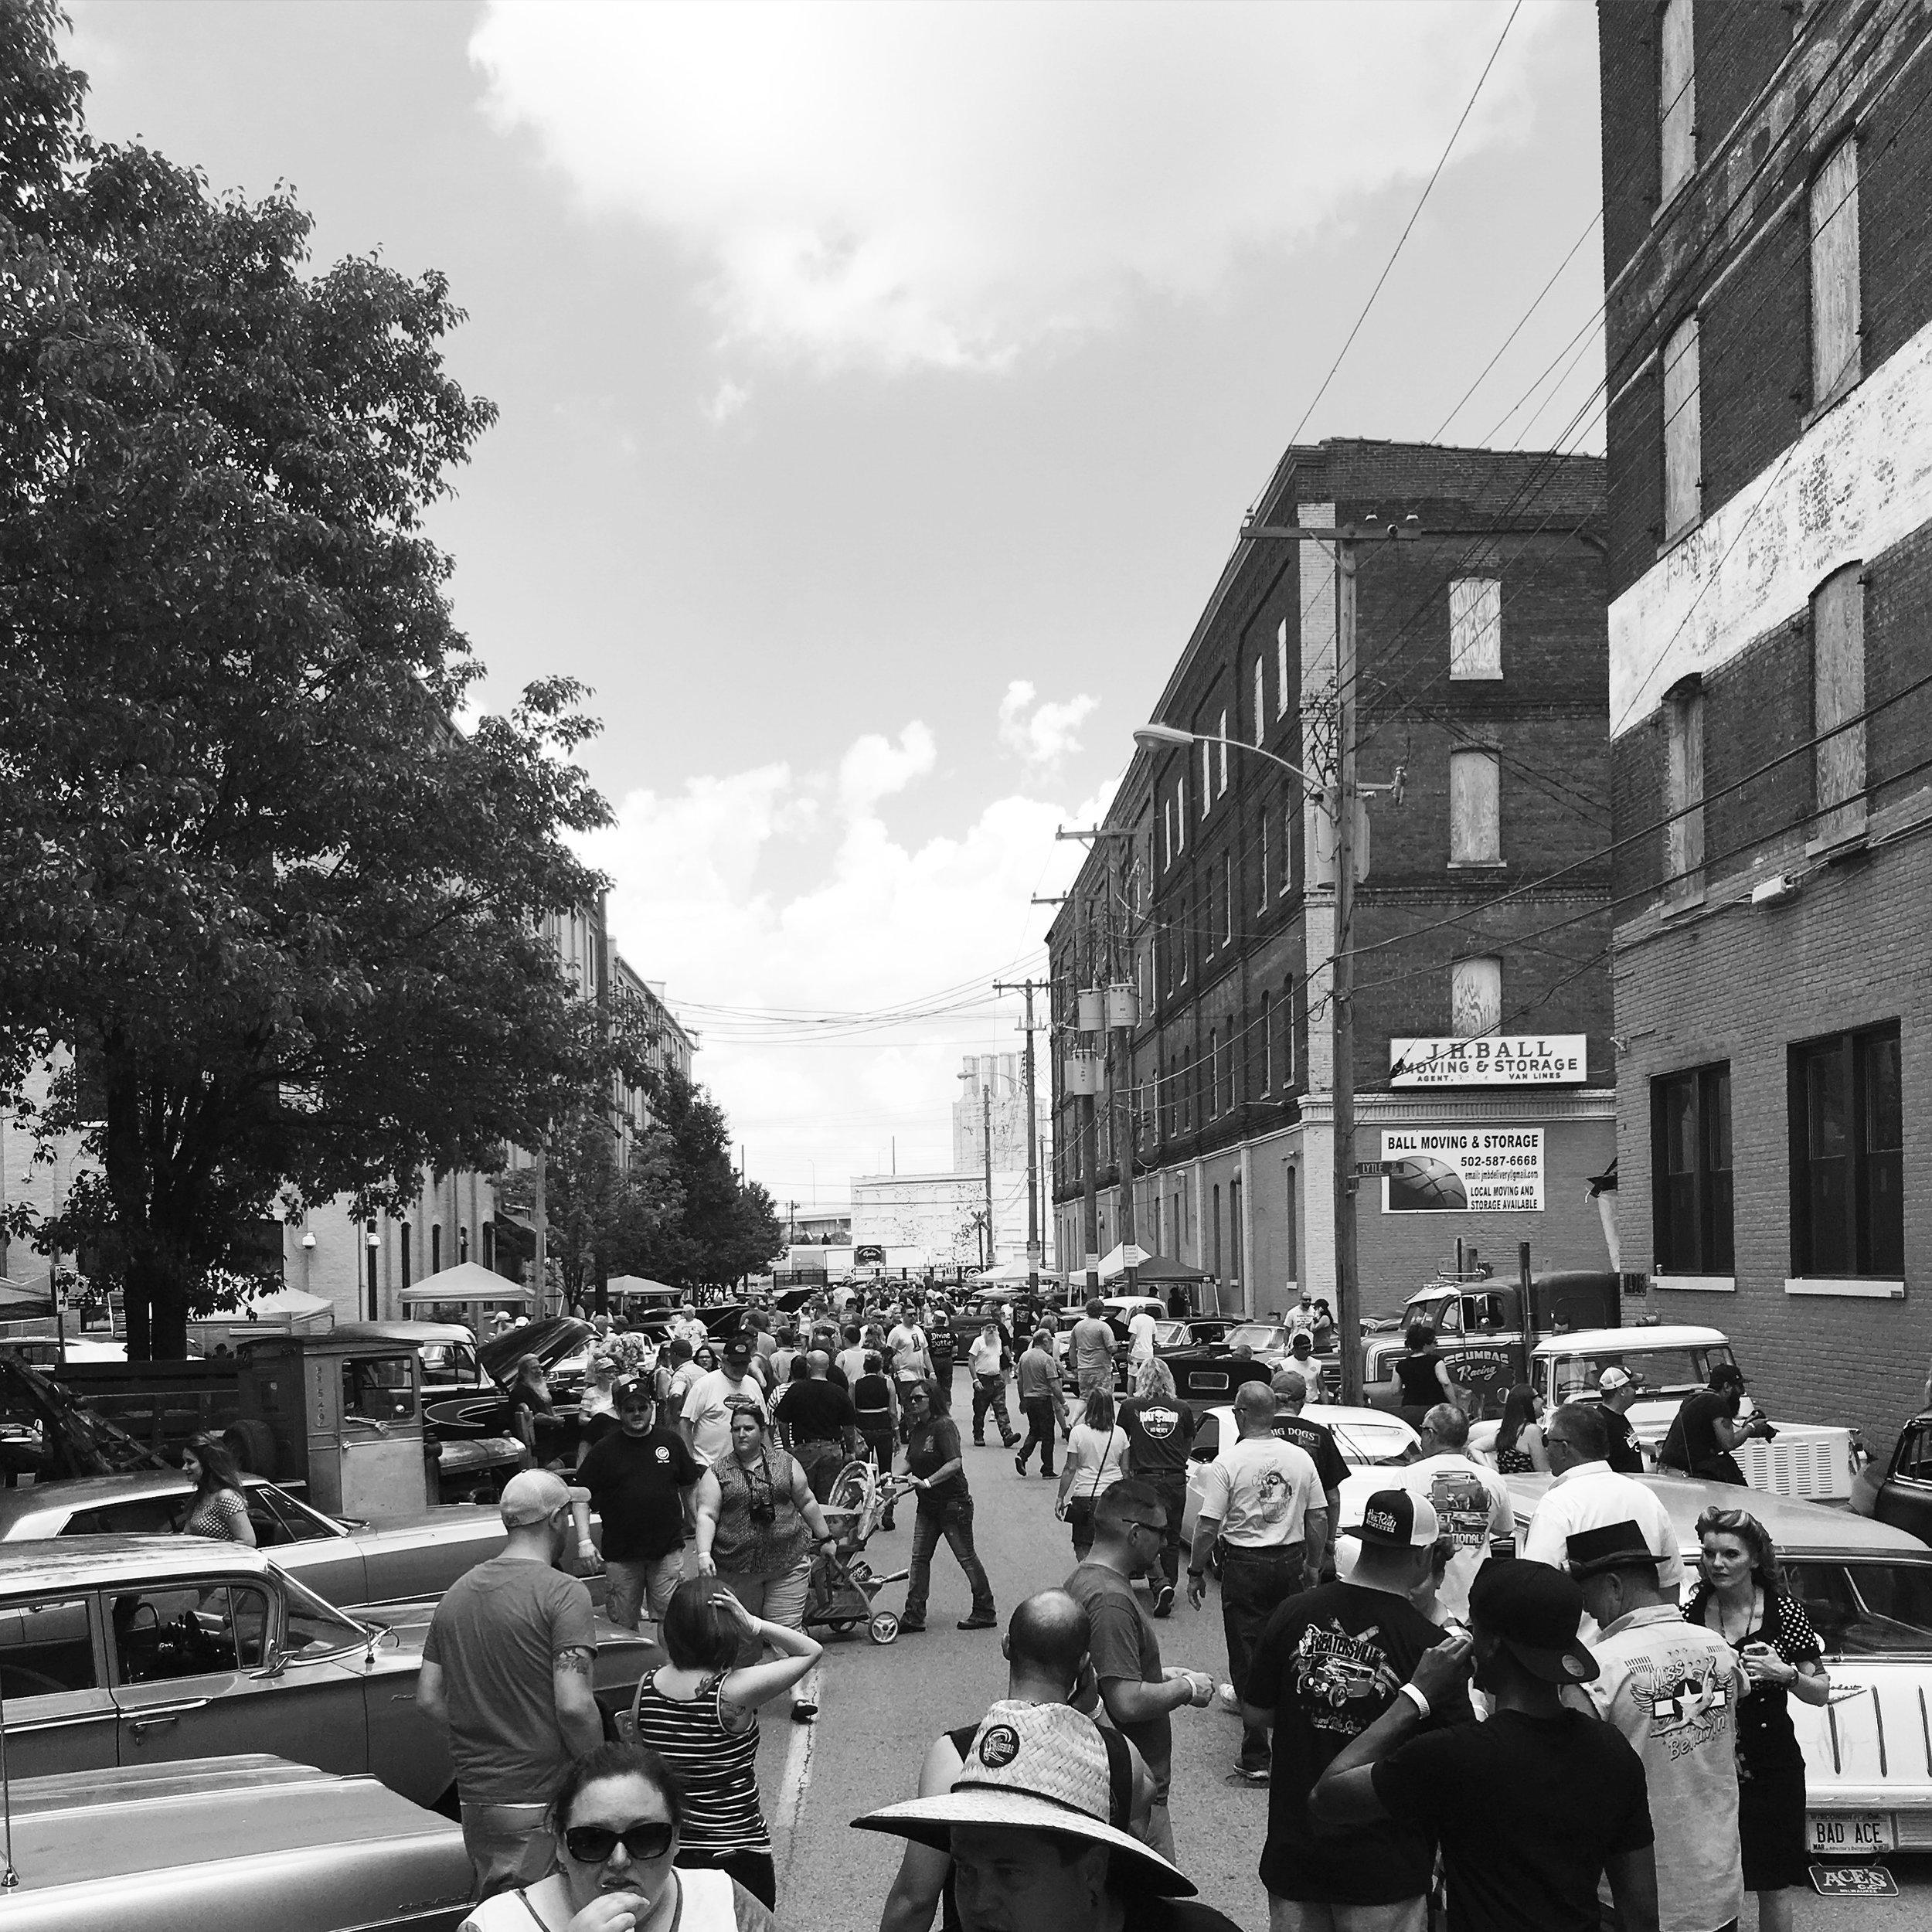 """Portland Car Show"" by Adam Horton, 8x11in, photograph"